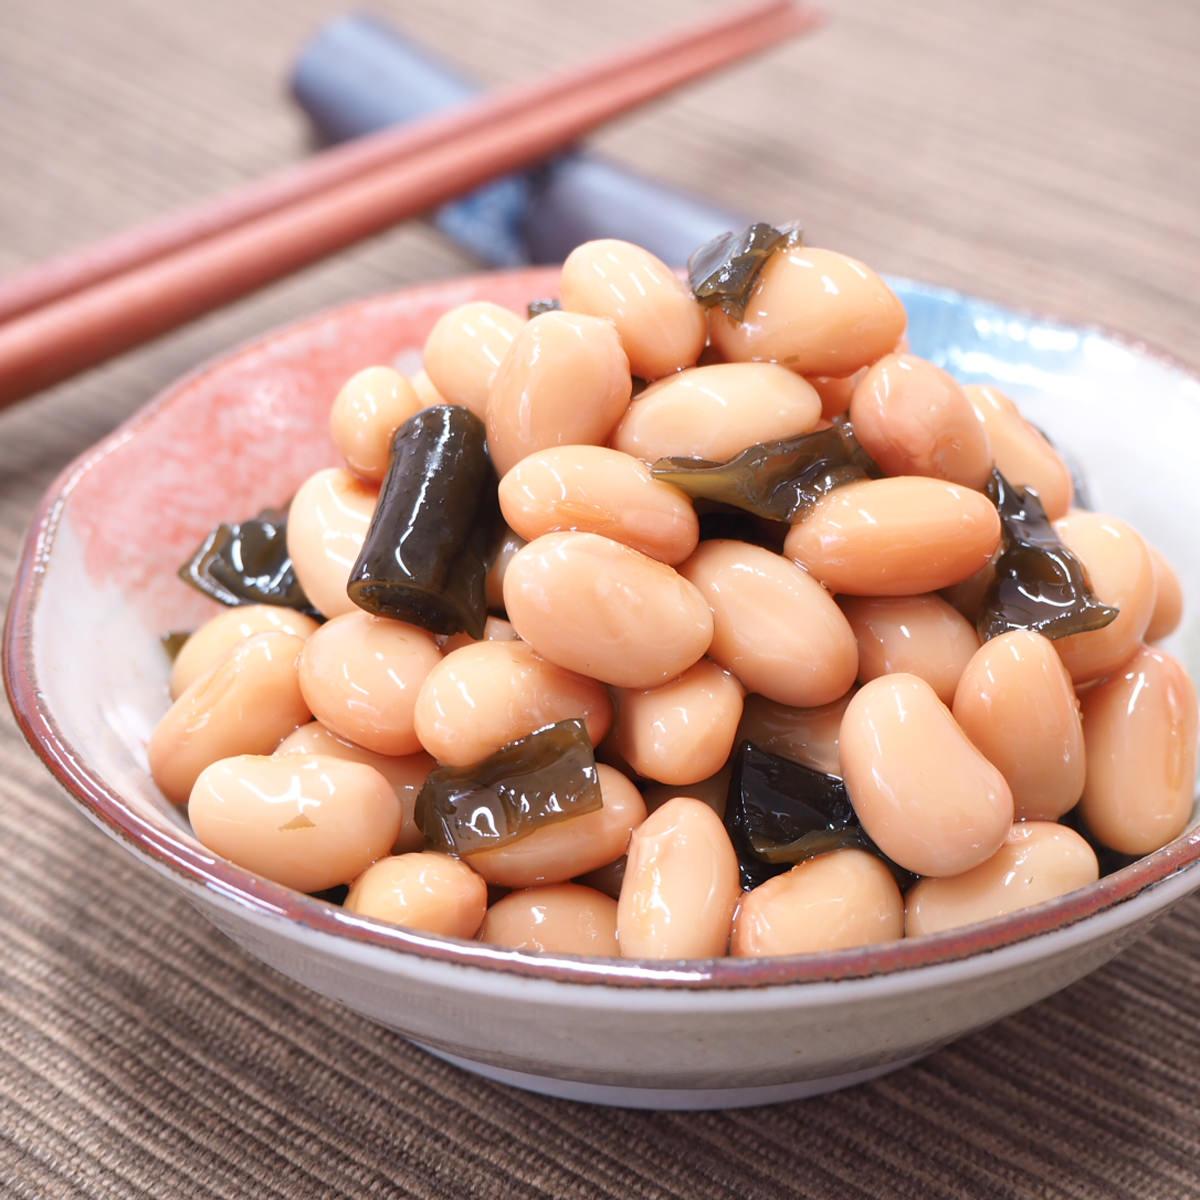 減塩煮豆2種セット 〔減塩昆布豆105g×3・減塩野菜豆100g×3〕 愛知県 惣菜 カネハツ